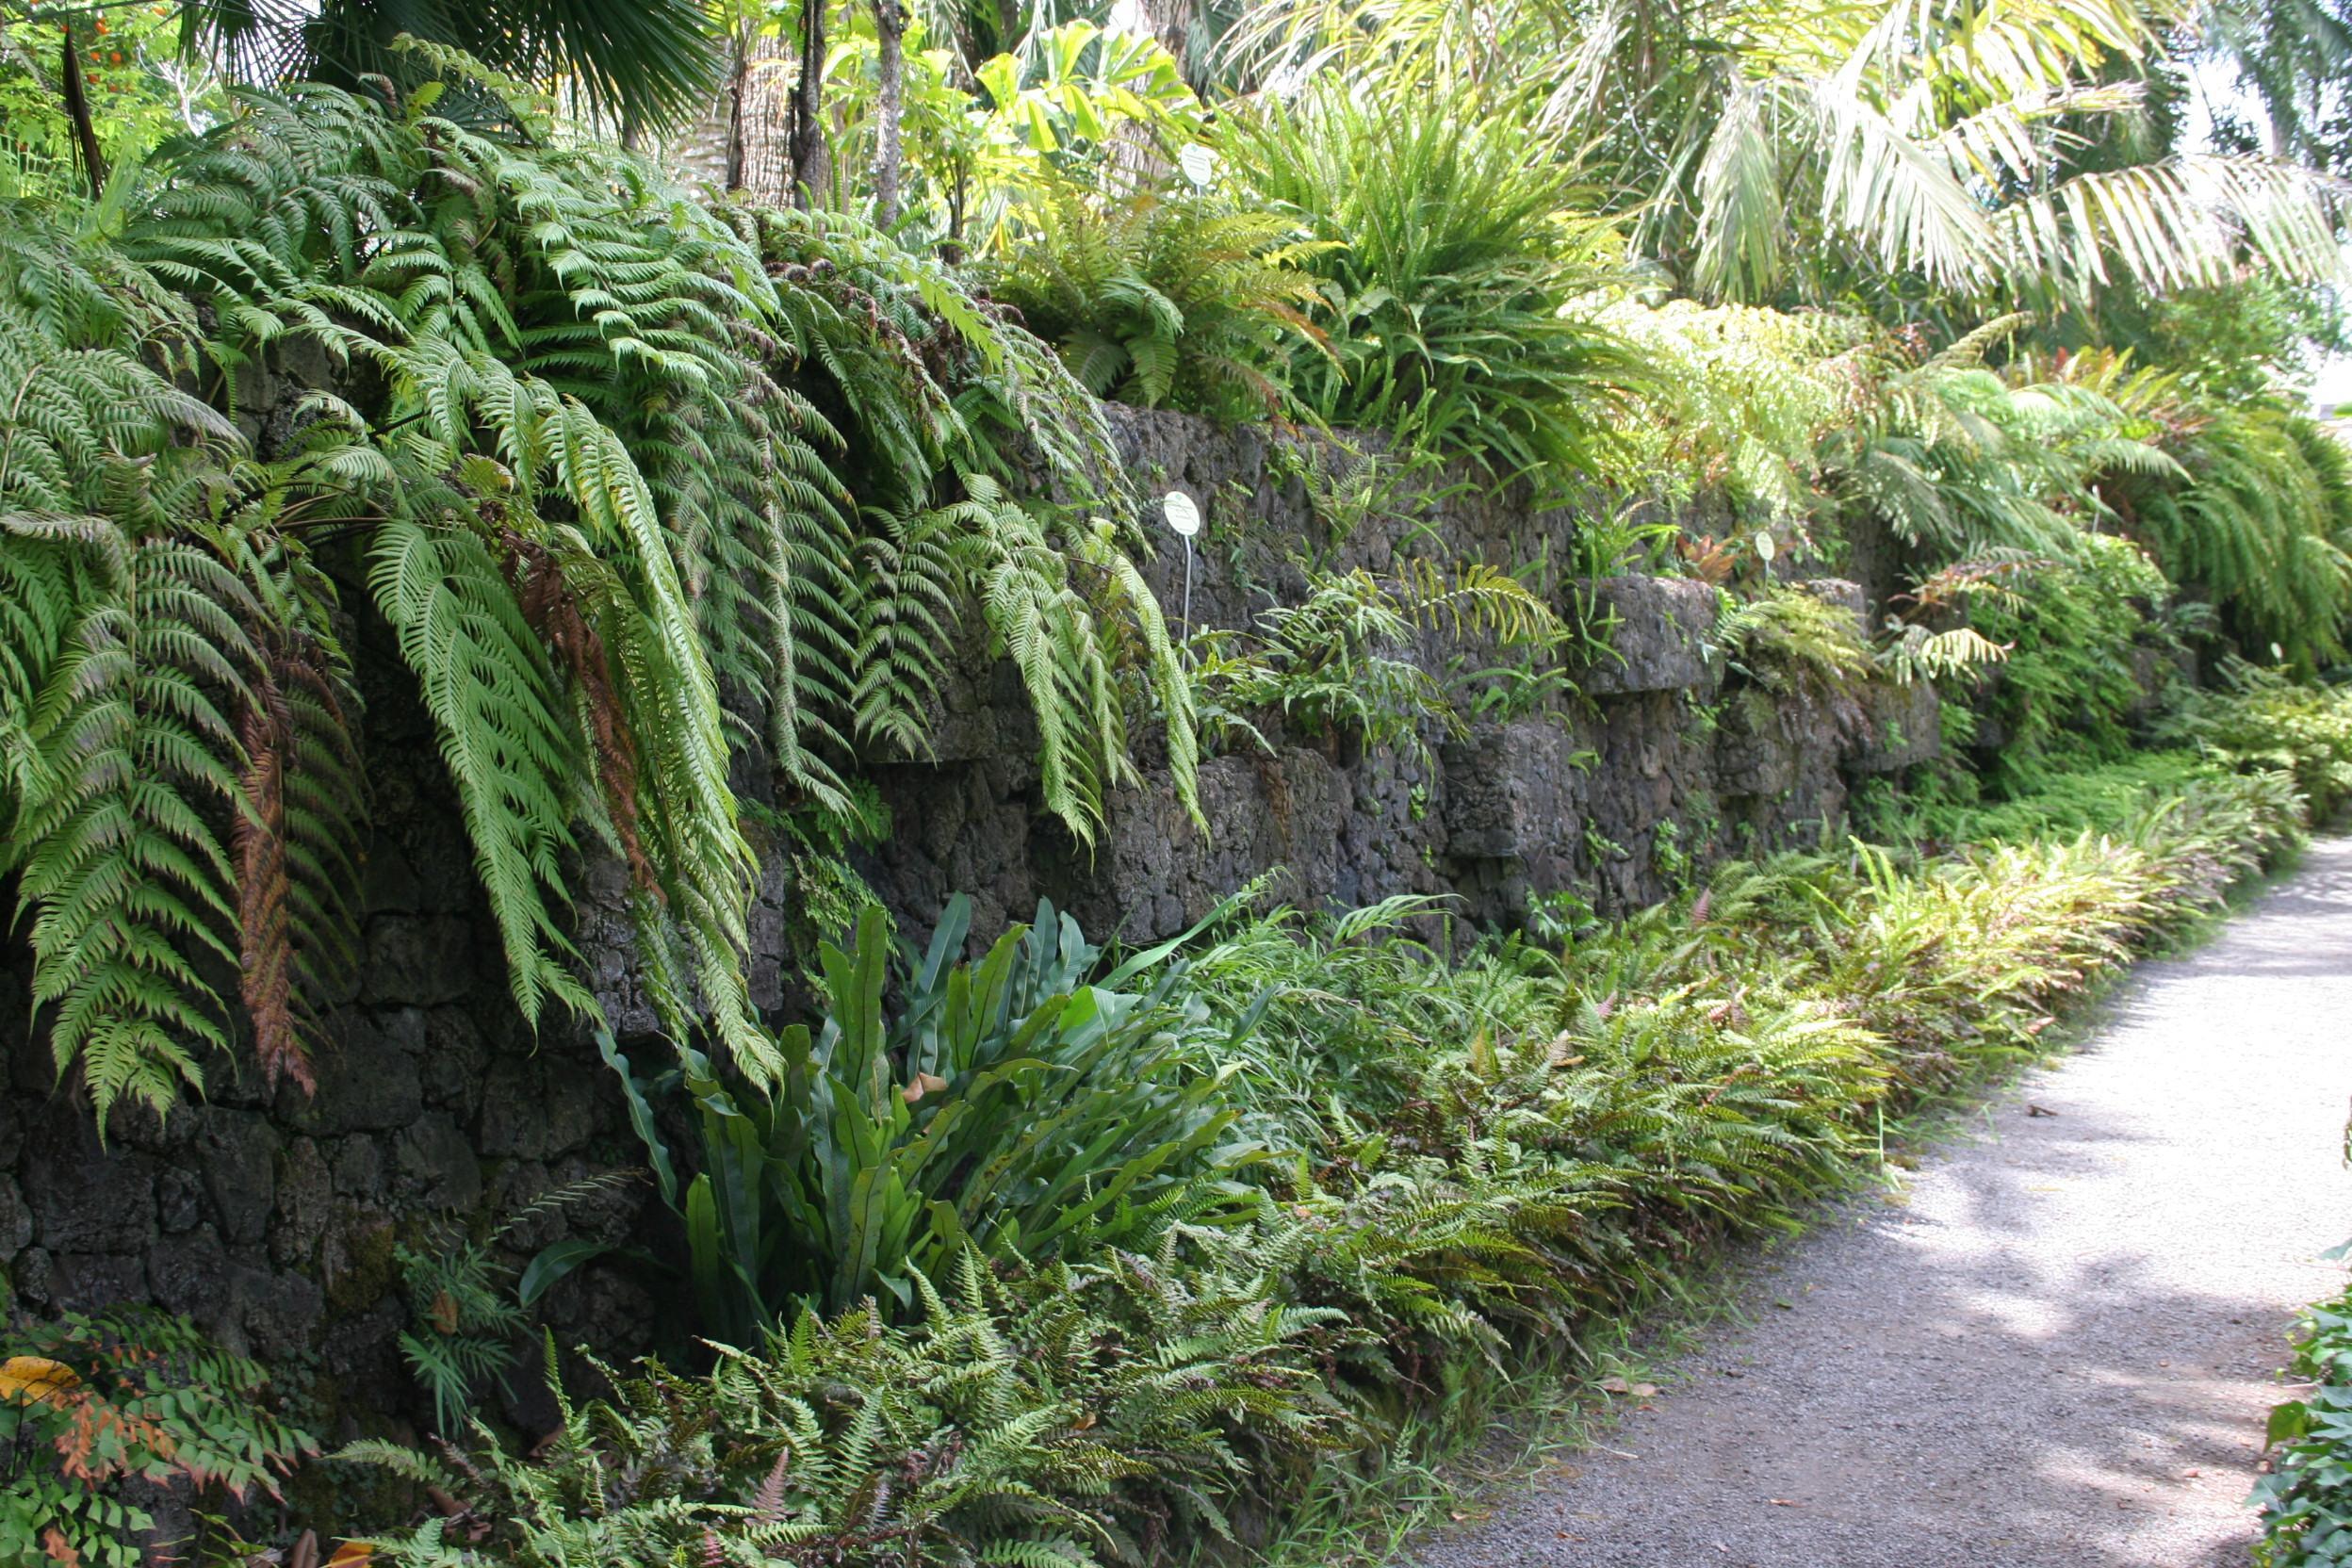 Orto botanico di la orotava jardin de aclimataci n for Jardin botanico numero telefonico